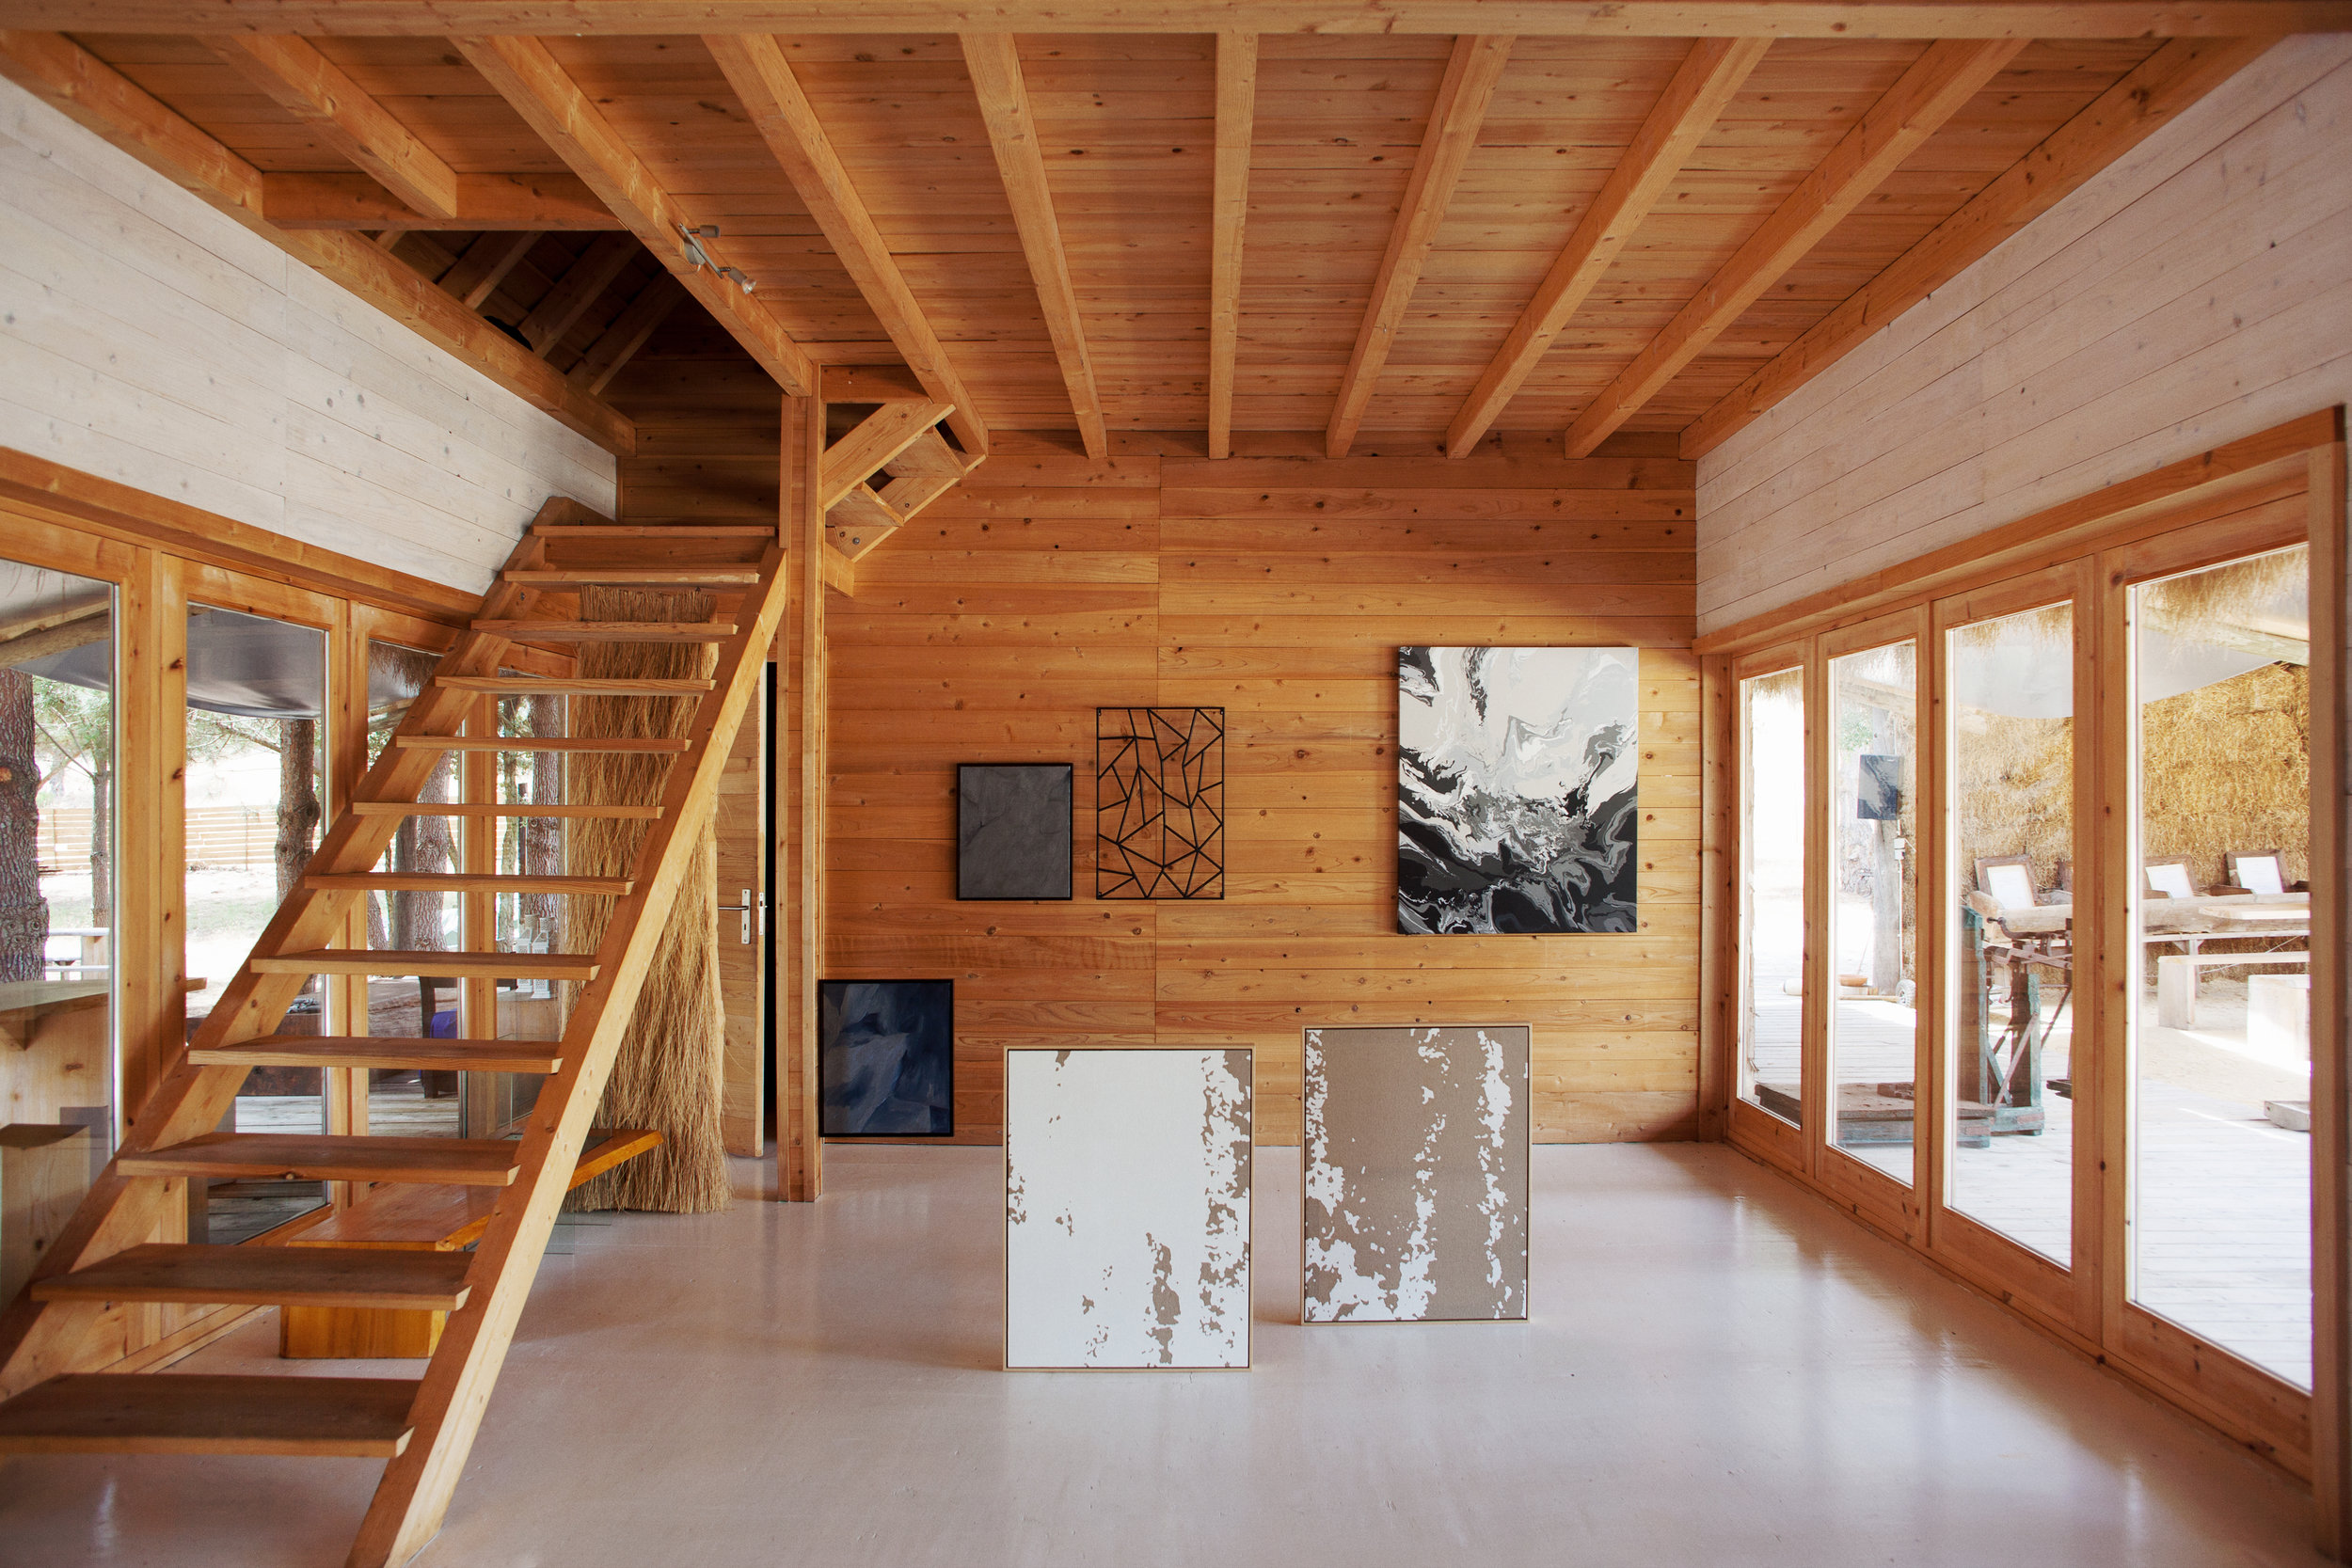 Installation view  (De)Nature,  Underdogs Gallery at Com.Horta, Comporta, Portugal, 2015 Photo: Pedro Matos